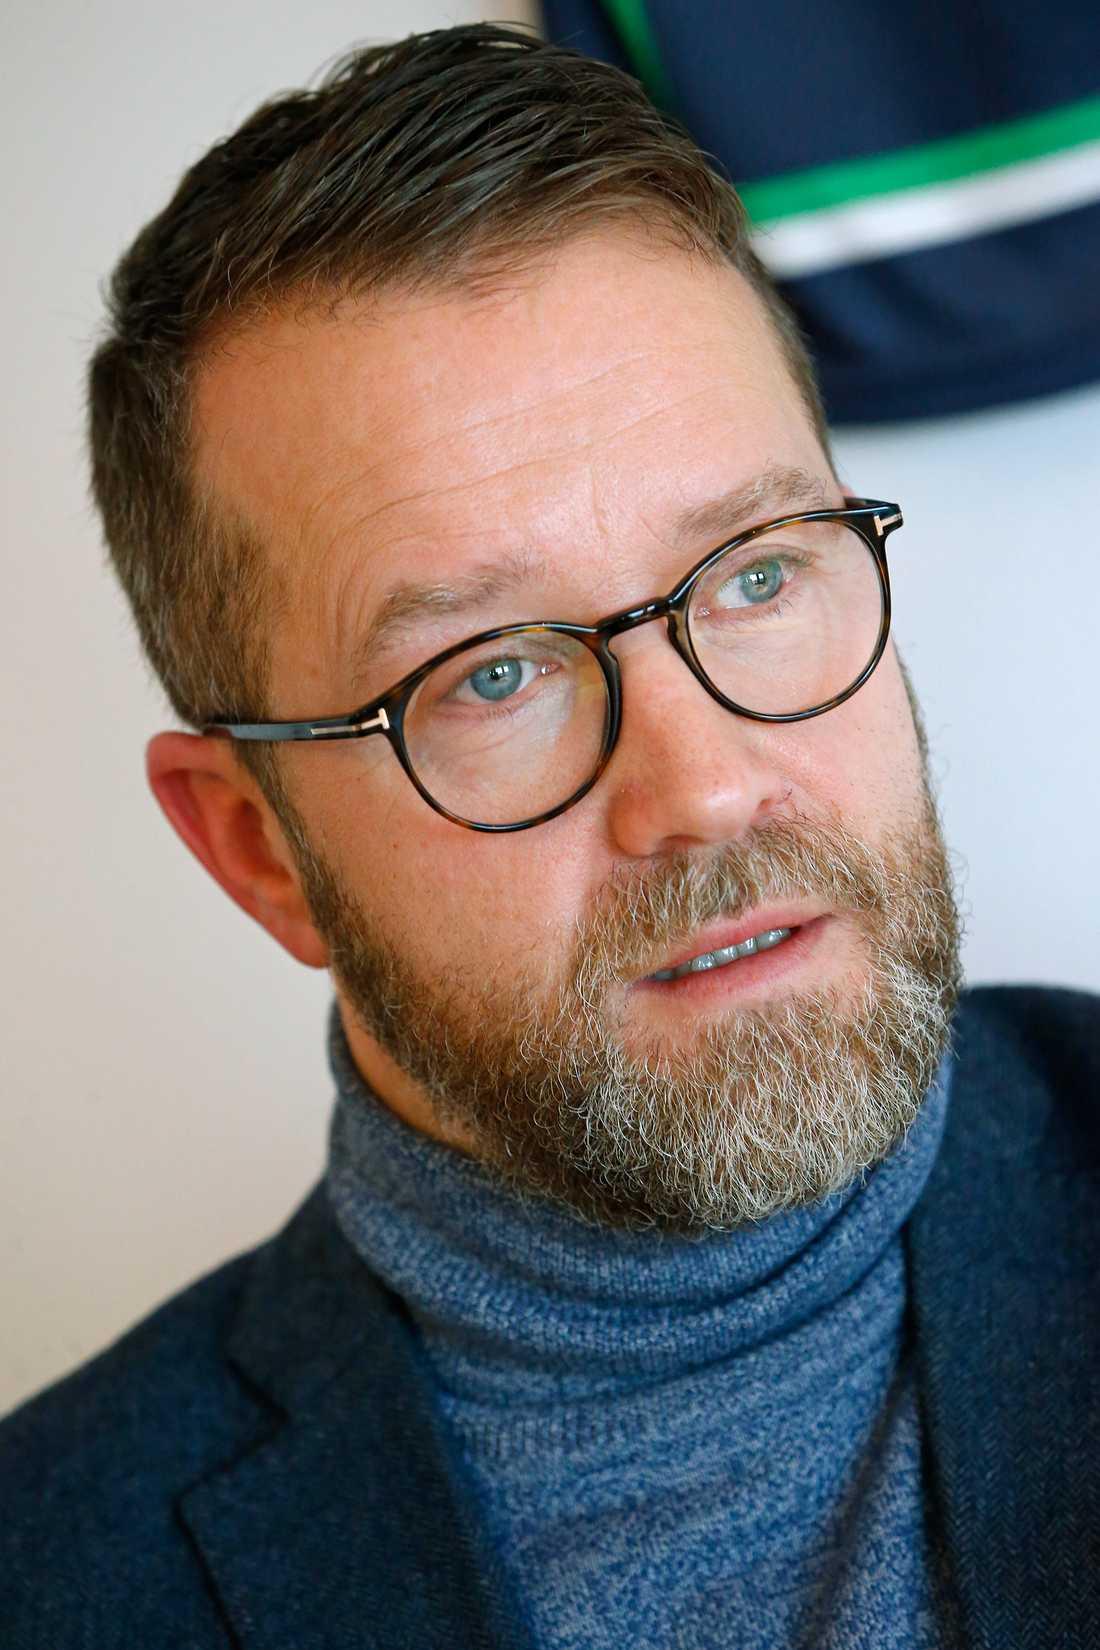 Solvallas sportchef Anders Malmrot